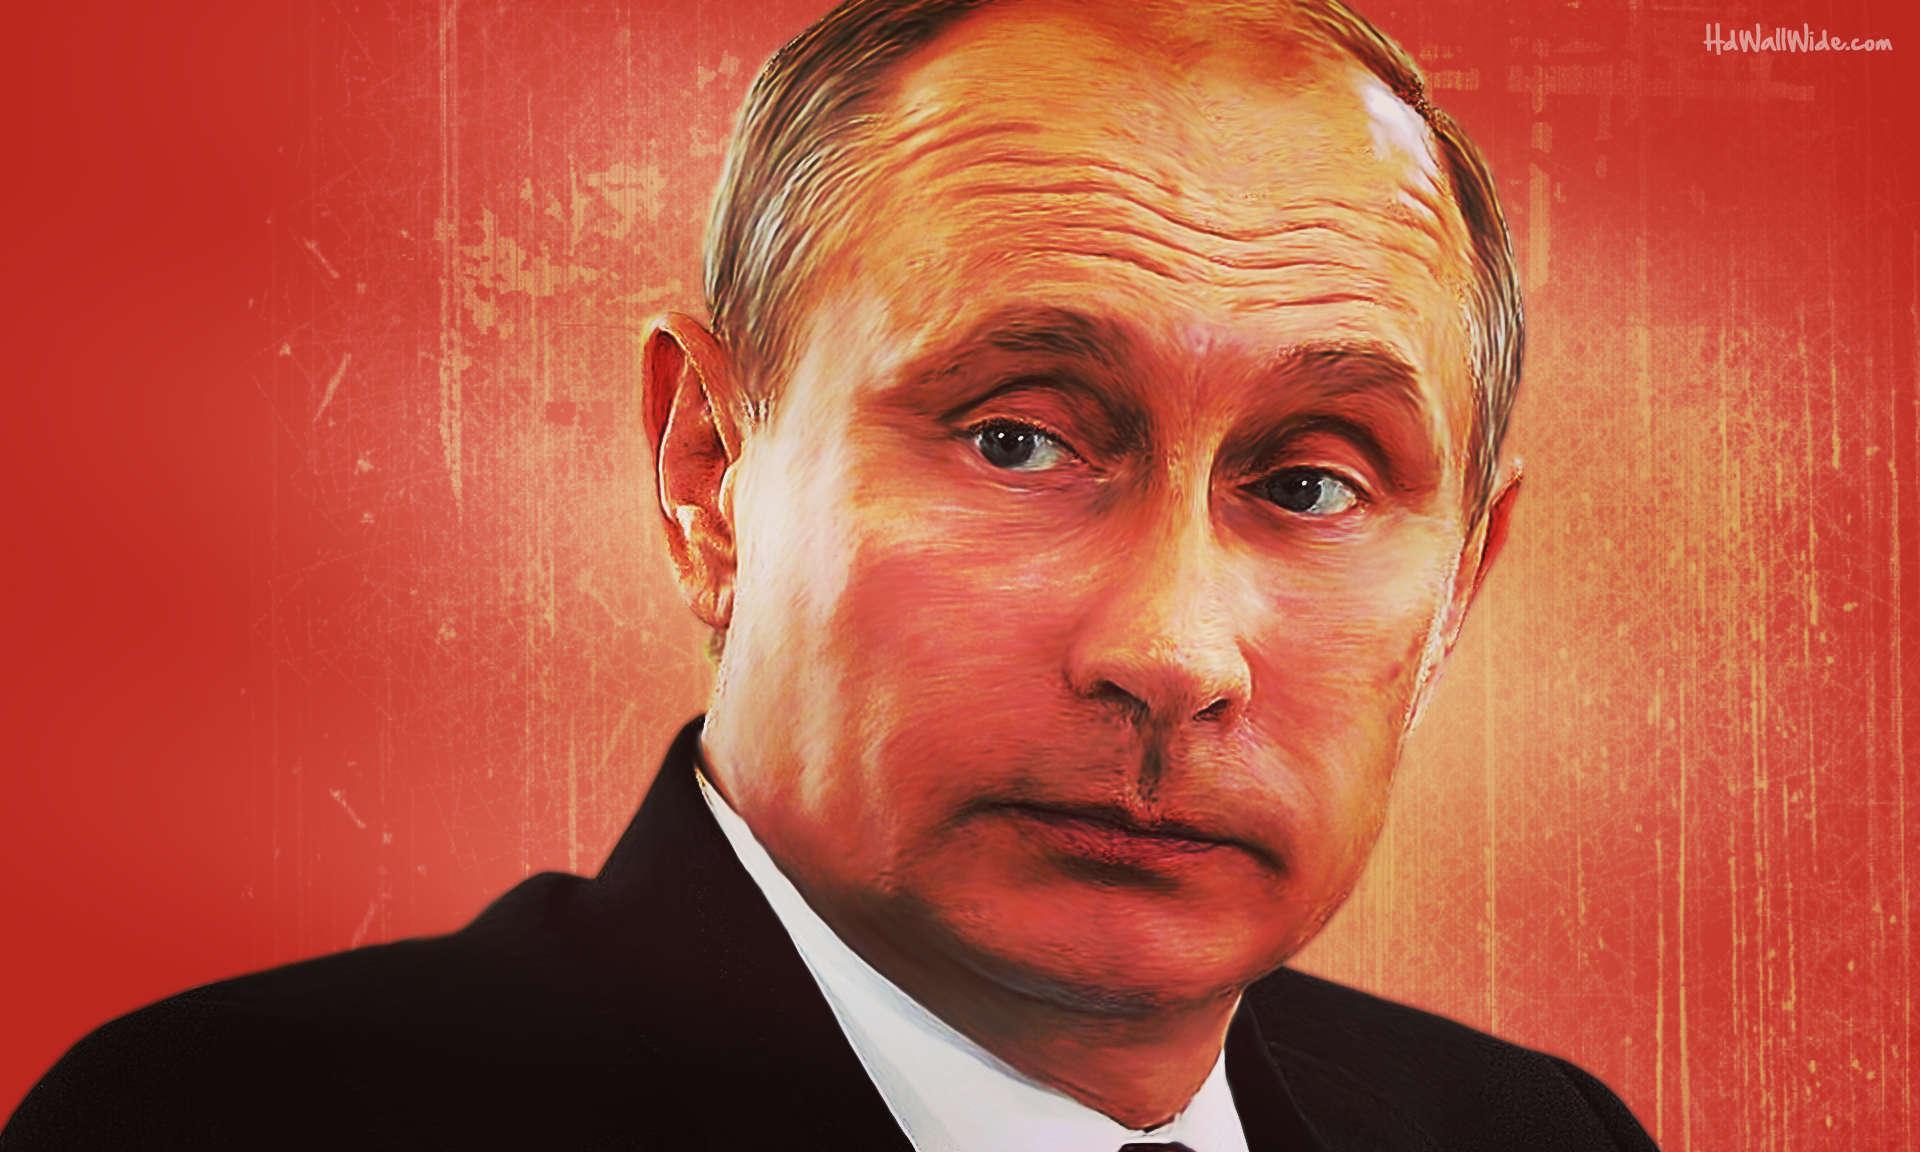 Vladimir Putin Wallpaper Hd Vladimir Putin 1170114 Hd Wallpaper Backgrounds Download